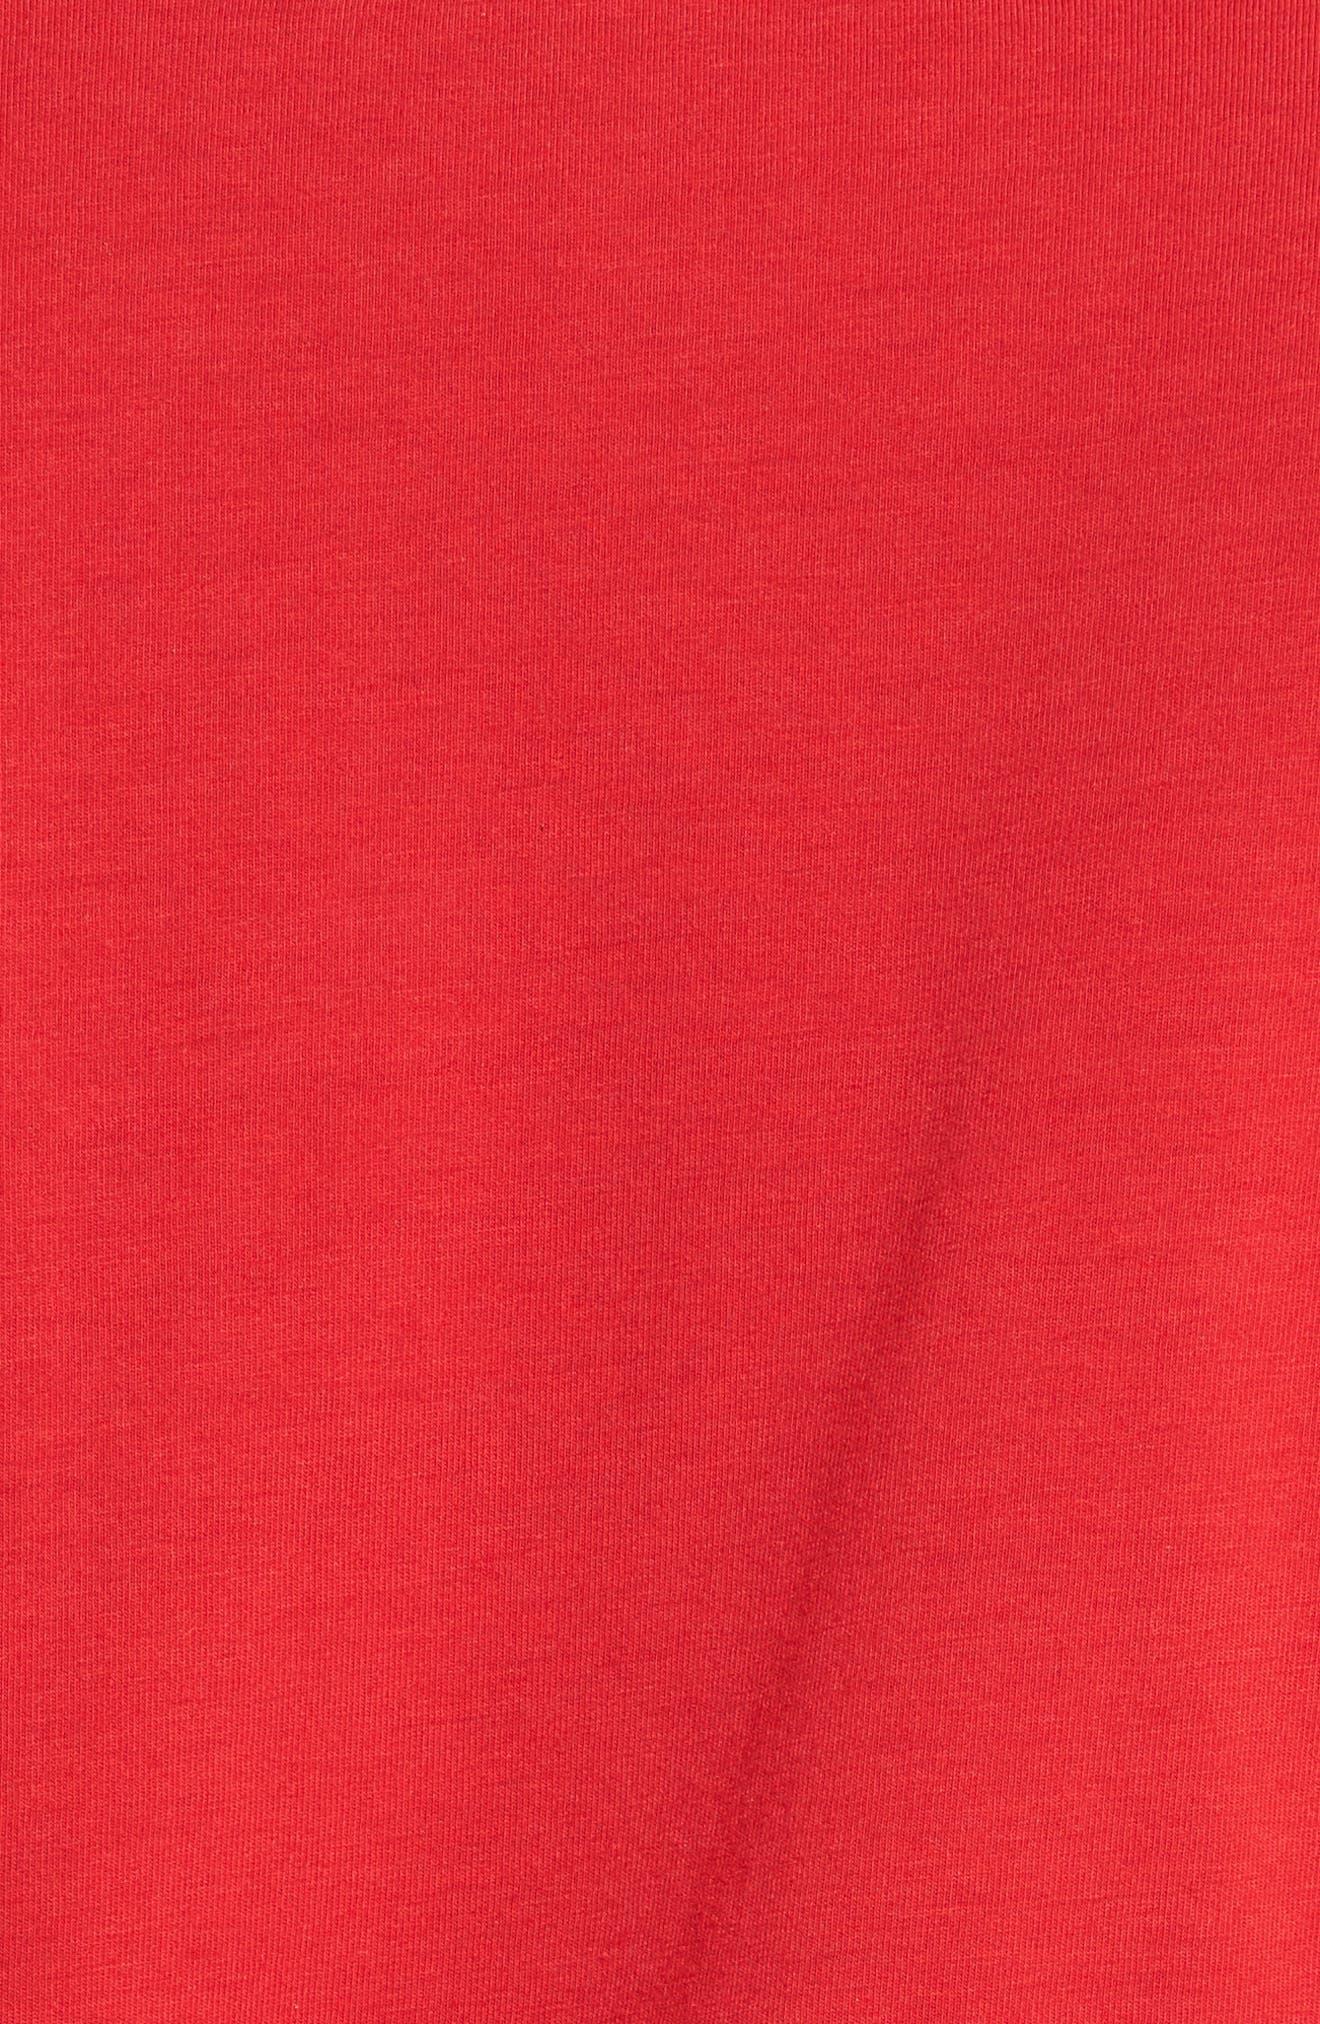 Tropicool T-Shirt,                             Alternate thumbnail 47, color,